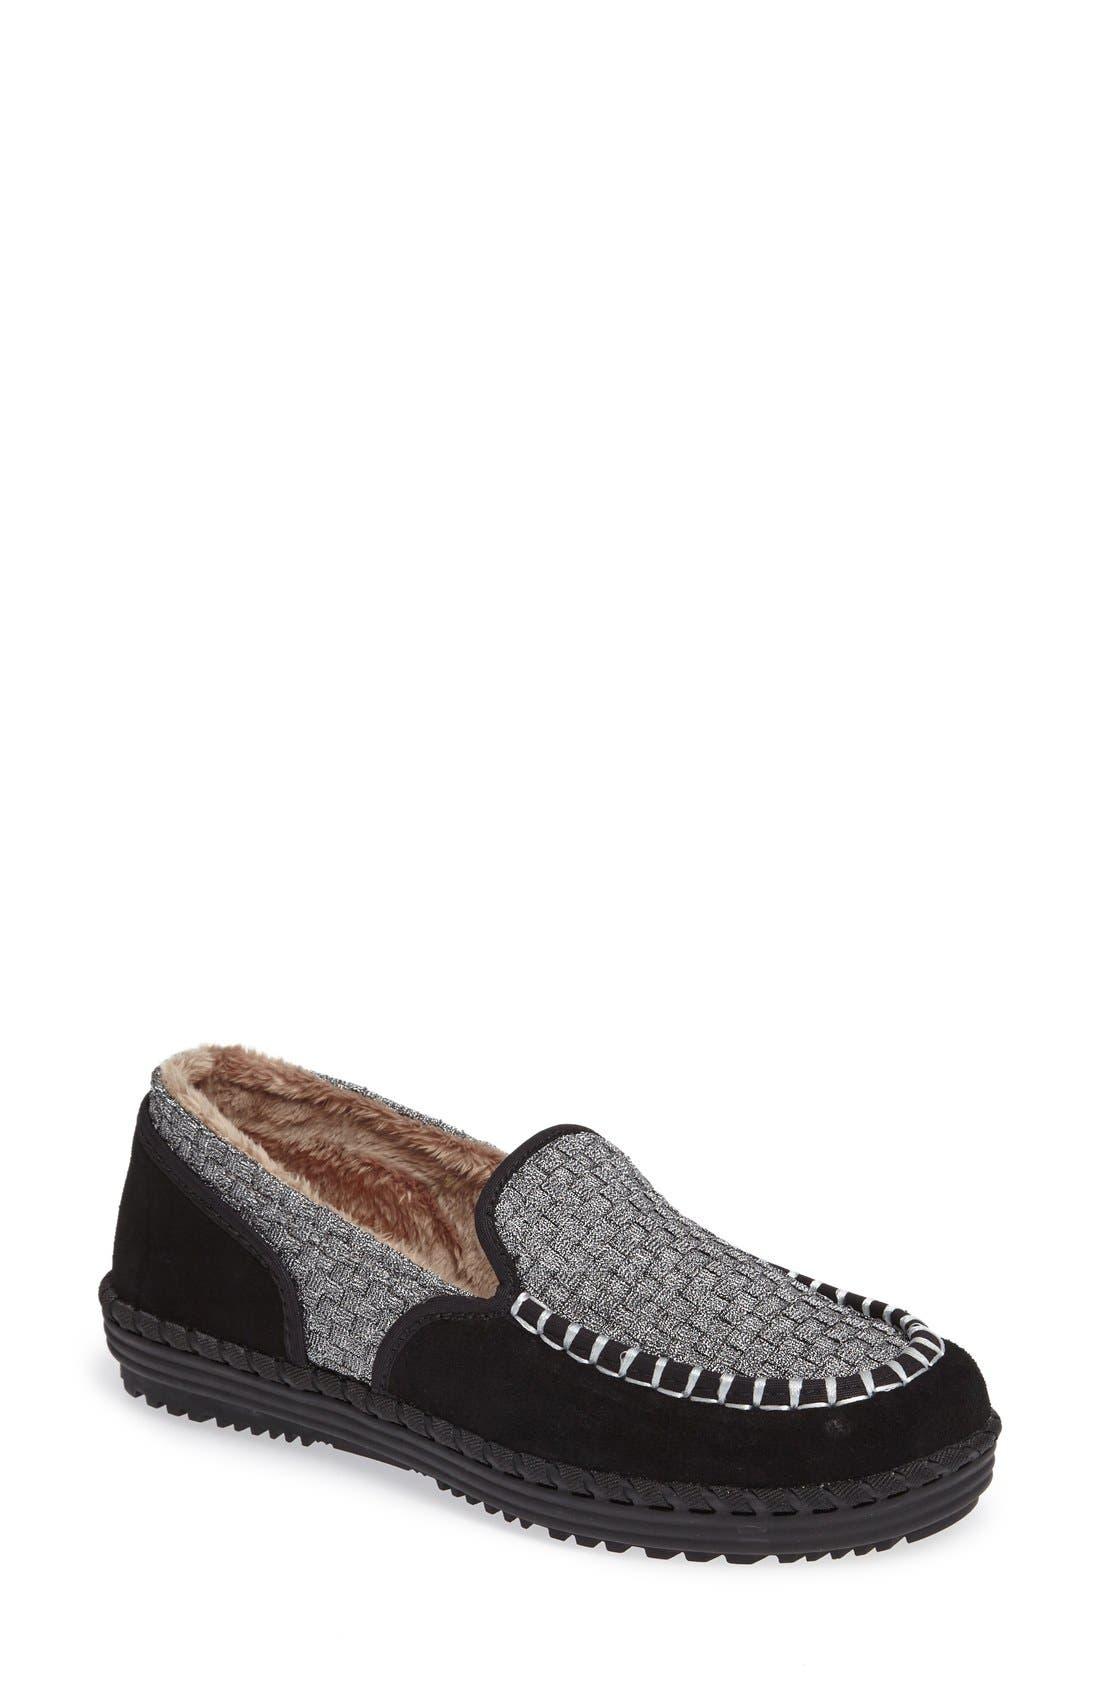 Alternate Image 1 Selected - bernie mev. Faux Fur Lined Loafer Slipper (Women)